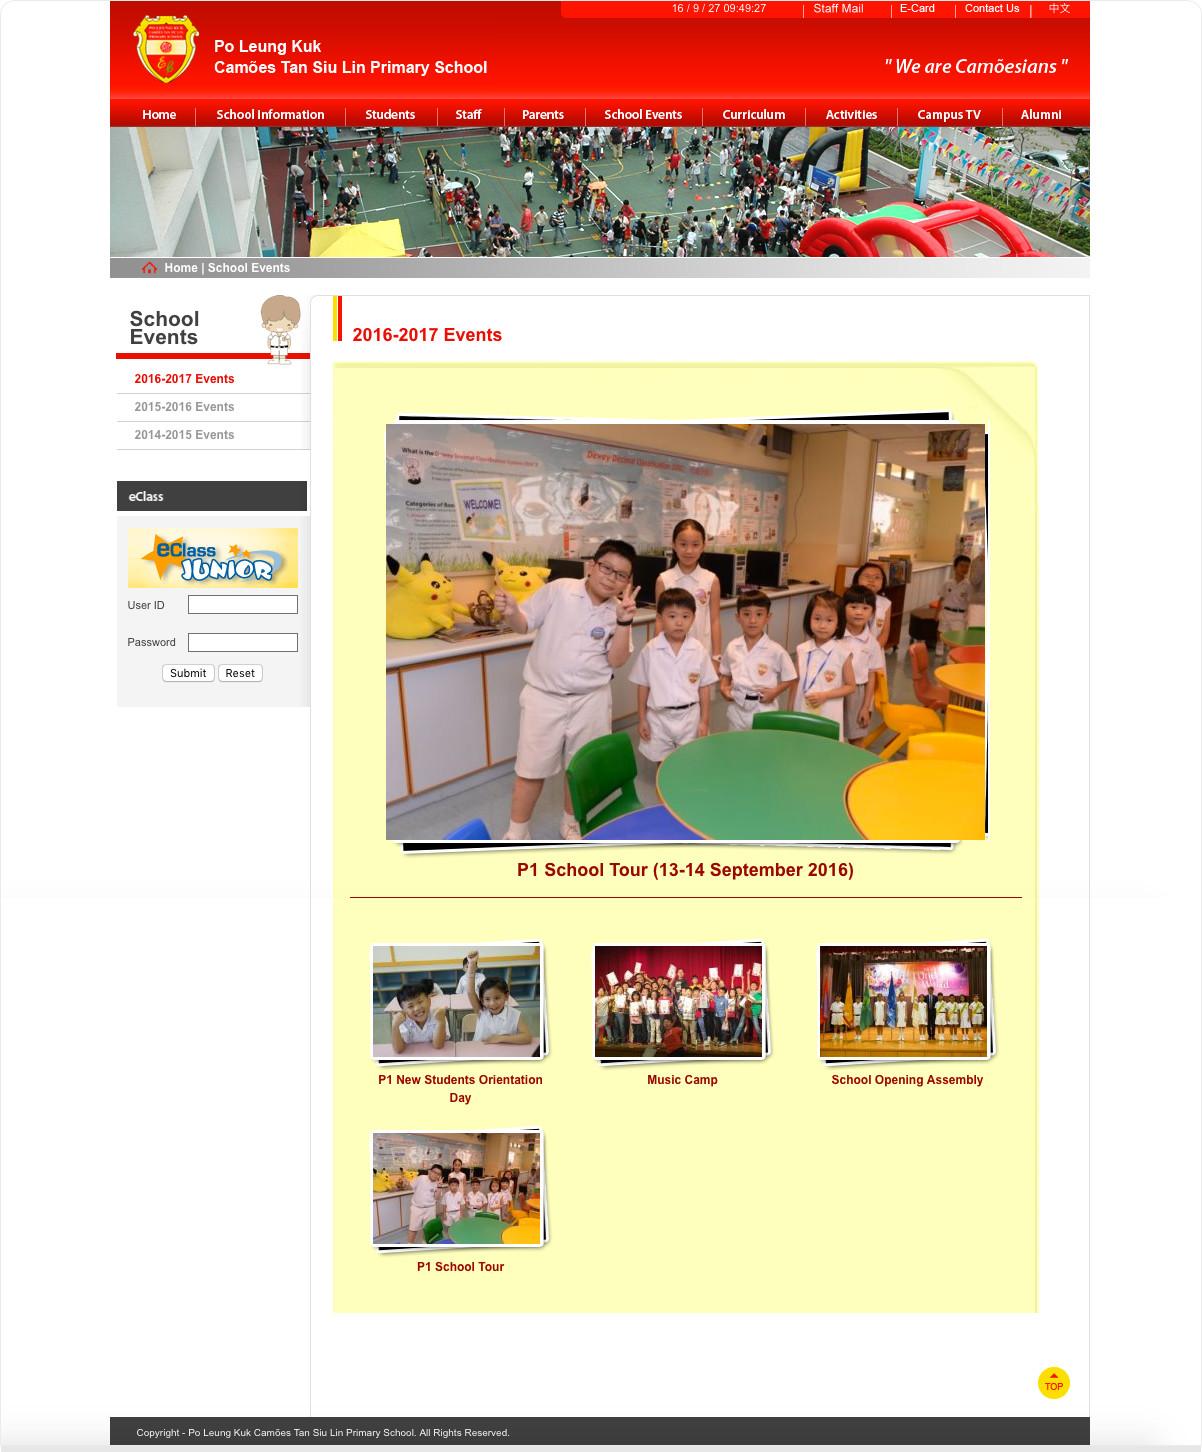 Po Leung Kuk Camões Tan Siu Lin Primary School